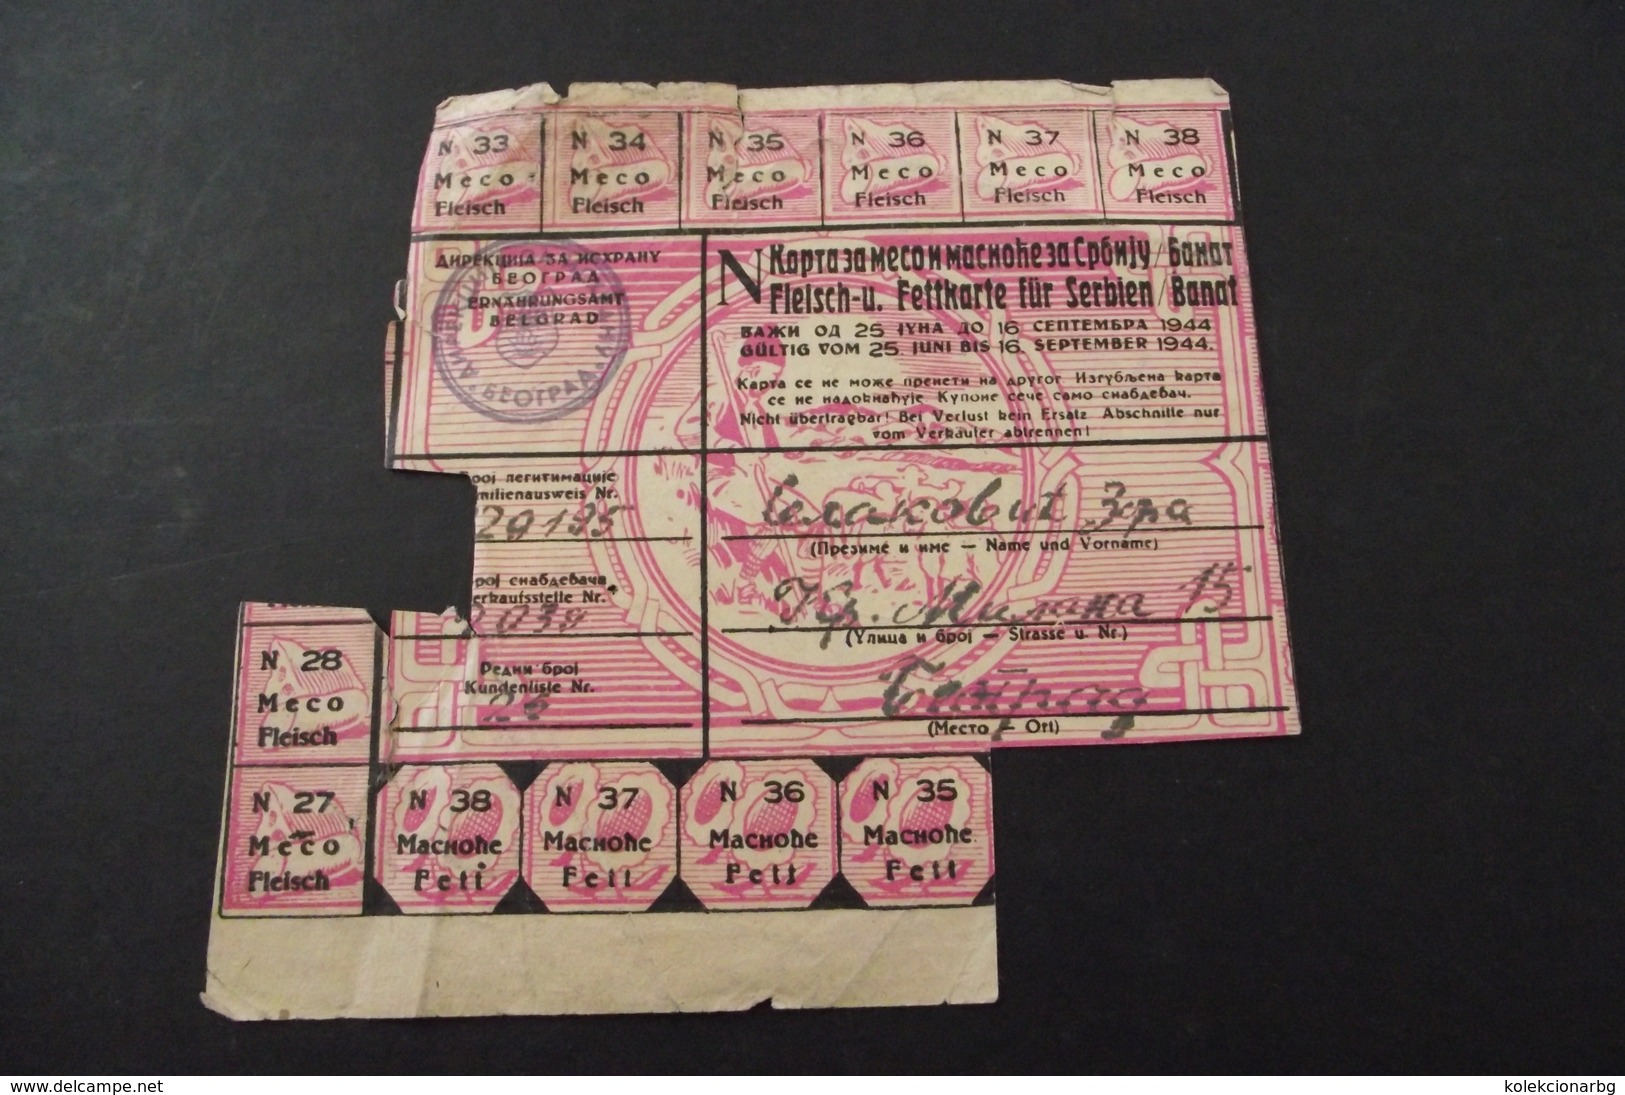 268.Ration Card Fleisch-u. Fettkarte Fur Serien Banat.   Karta Za Meso I Masnoce Za Srbiju/Banat - 1933-1945: Drittes Reich